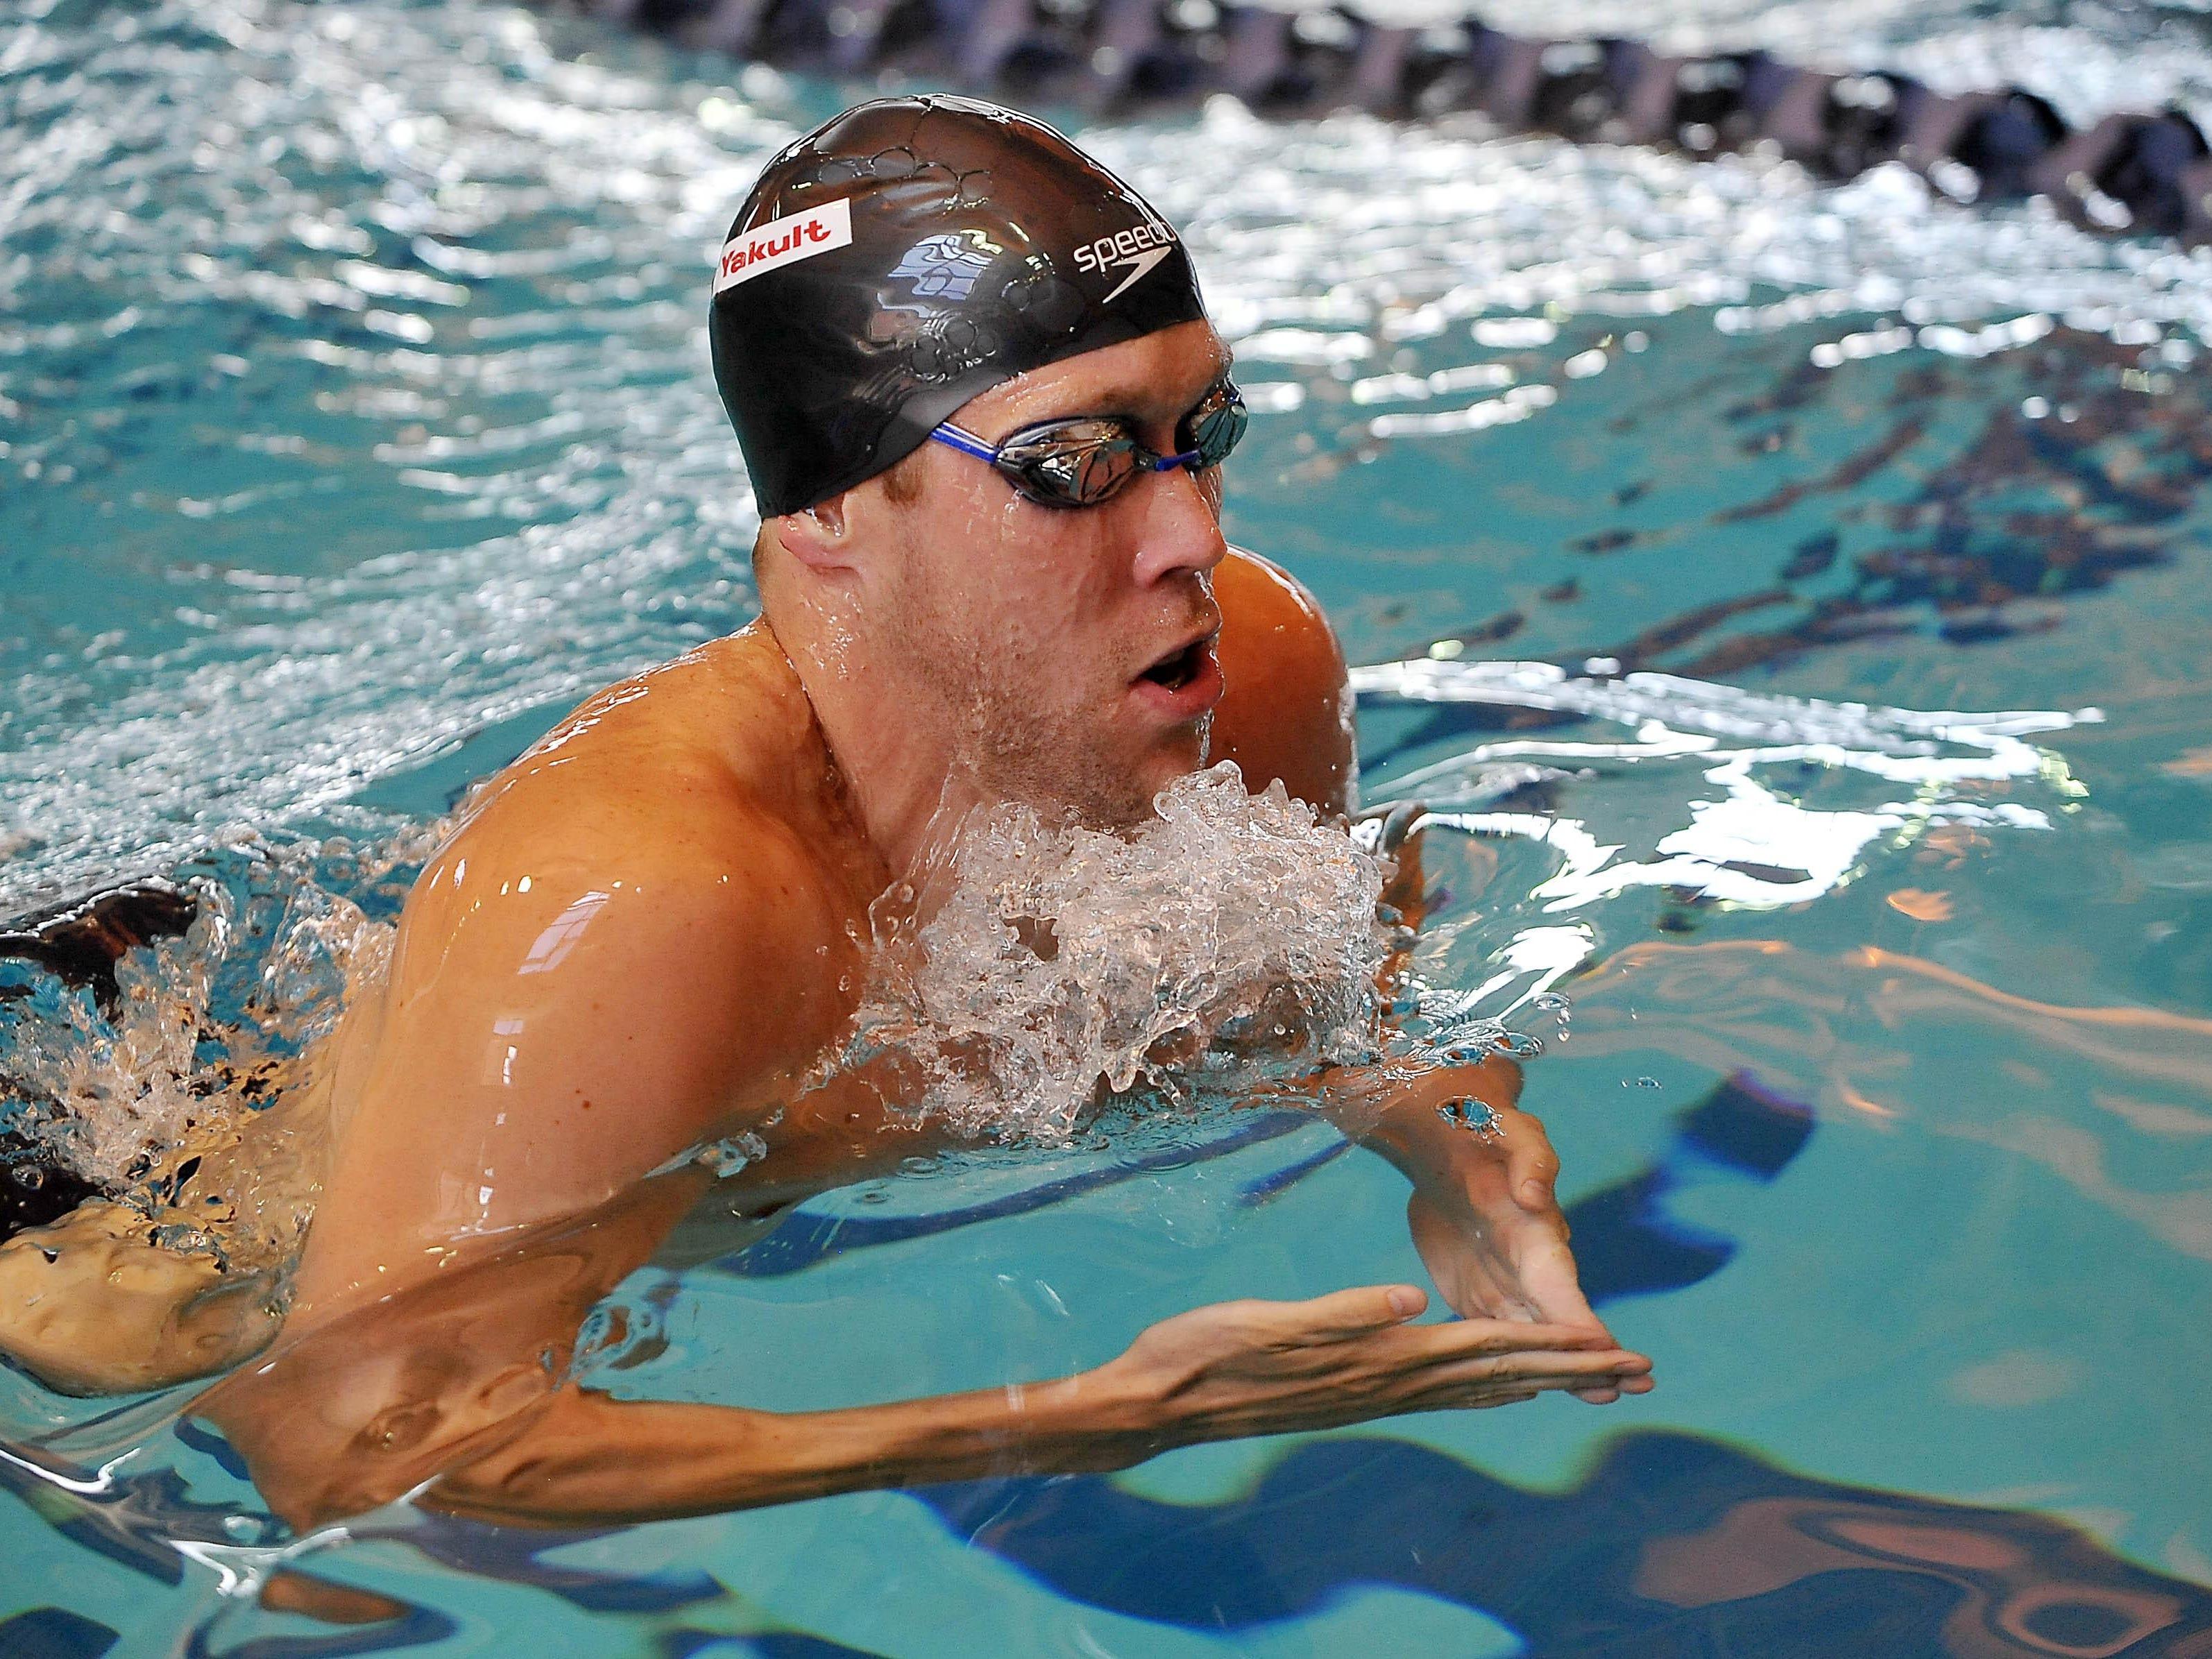 St. Augustine Prep graduate Brendan McHugh trains for the FINA World Swim Championships in Russia in July.